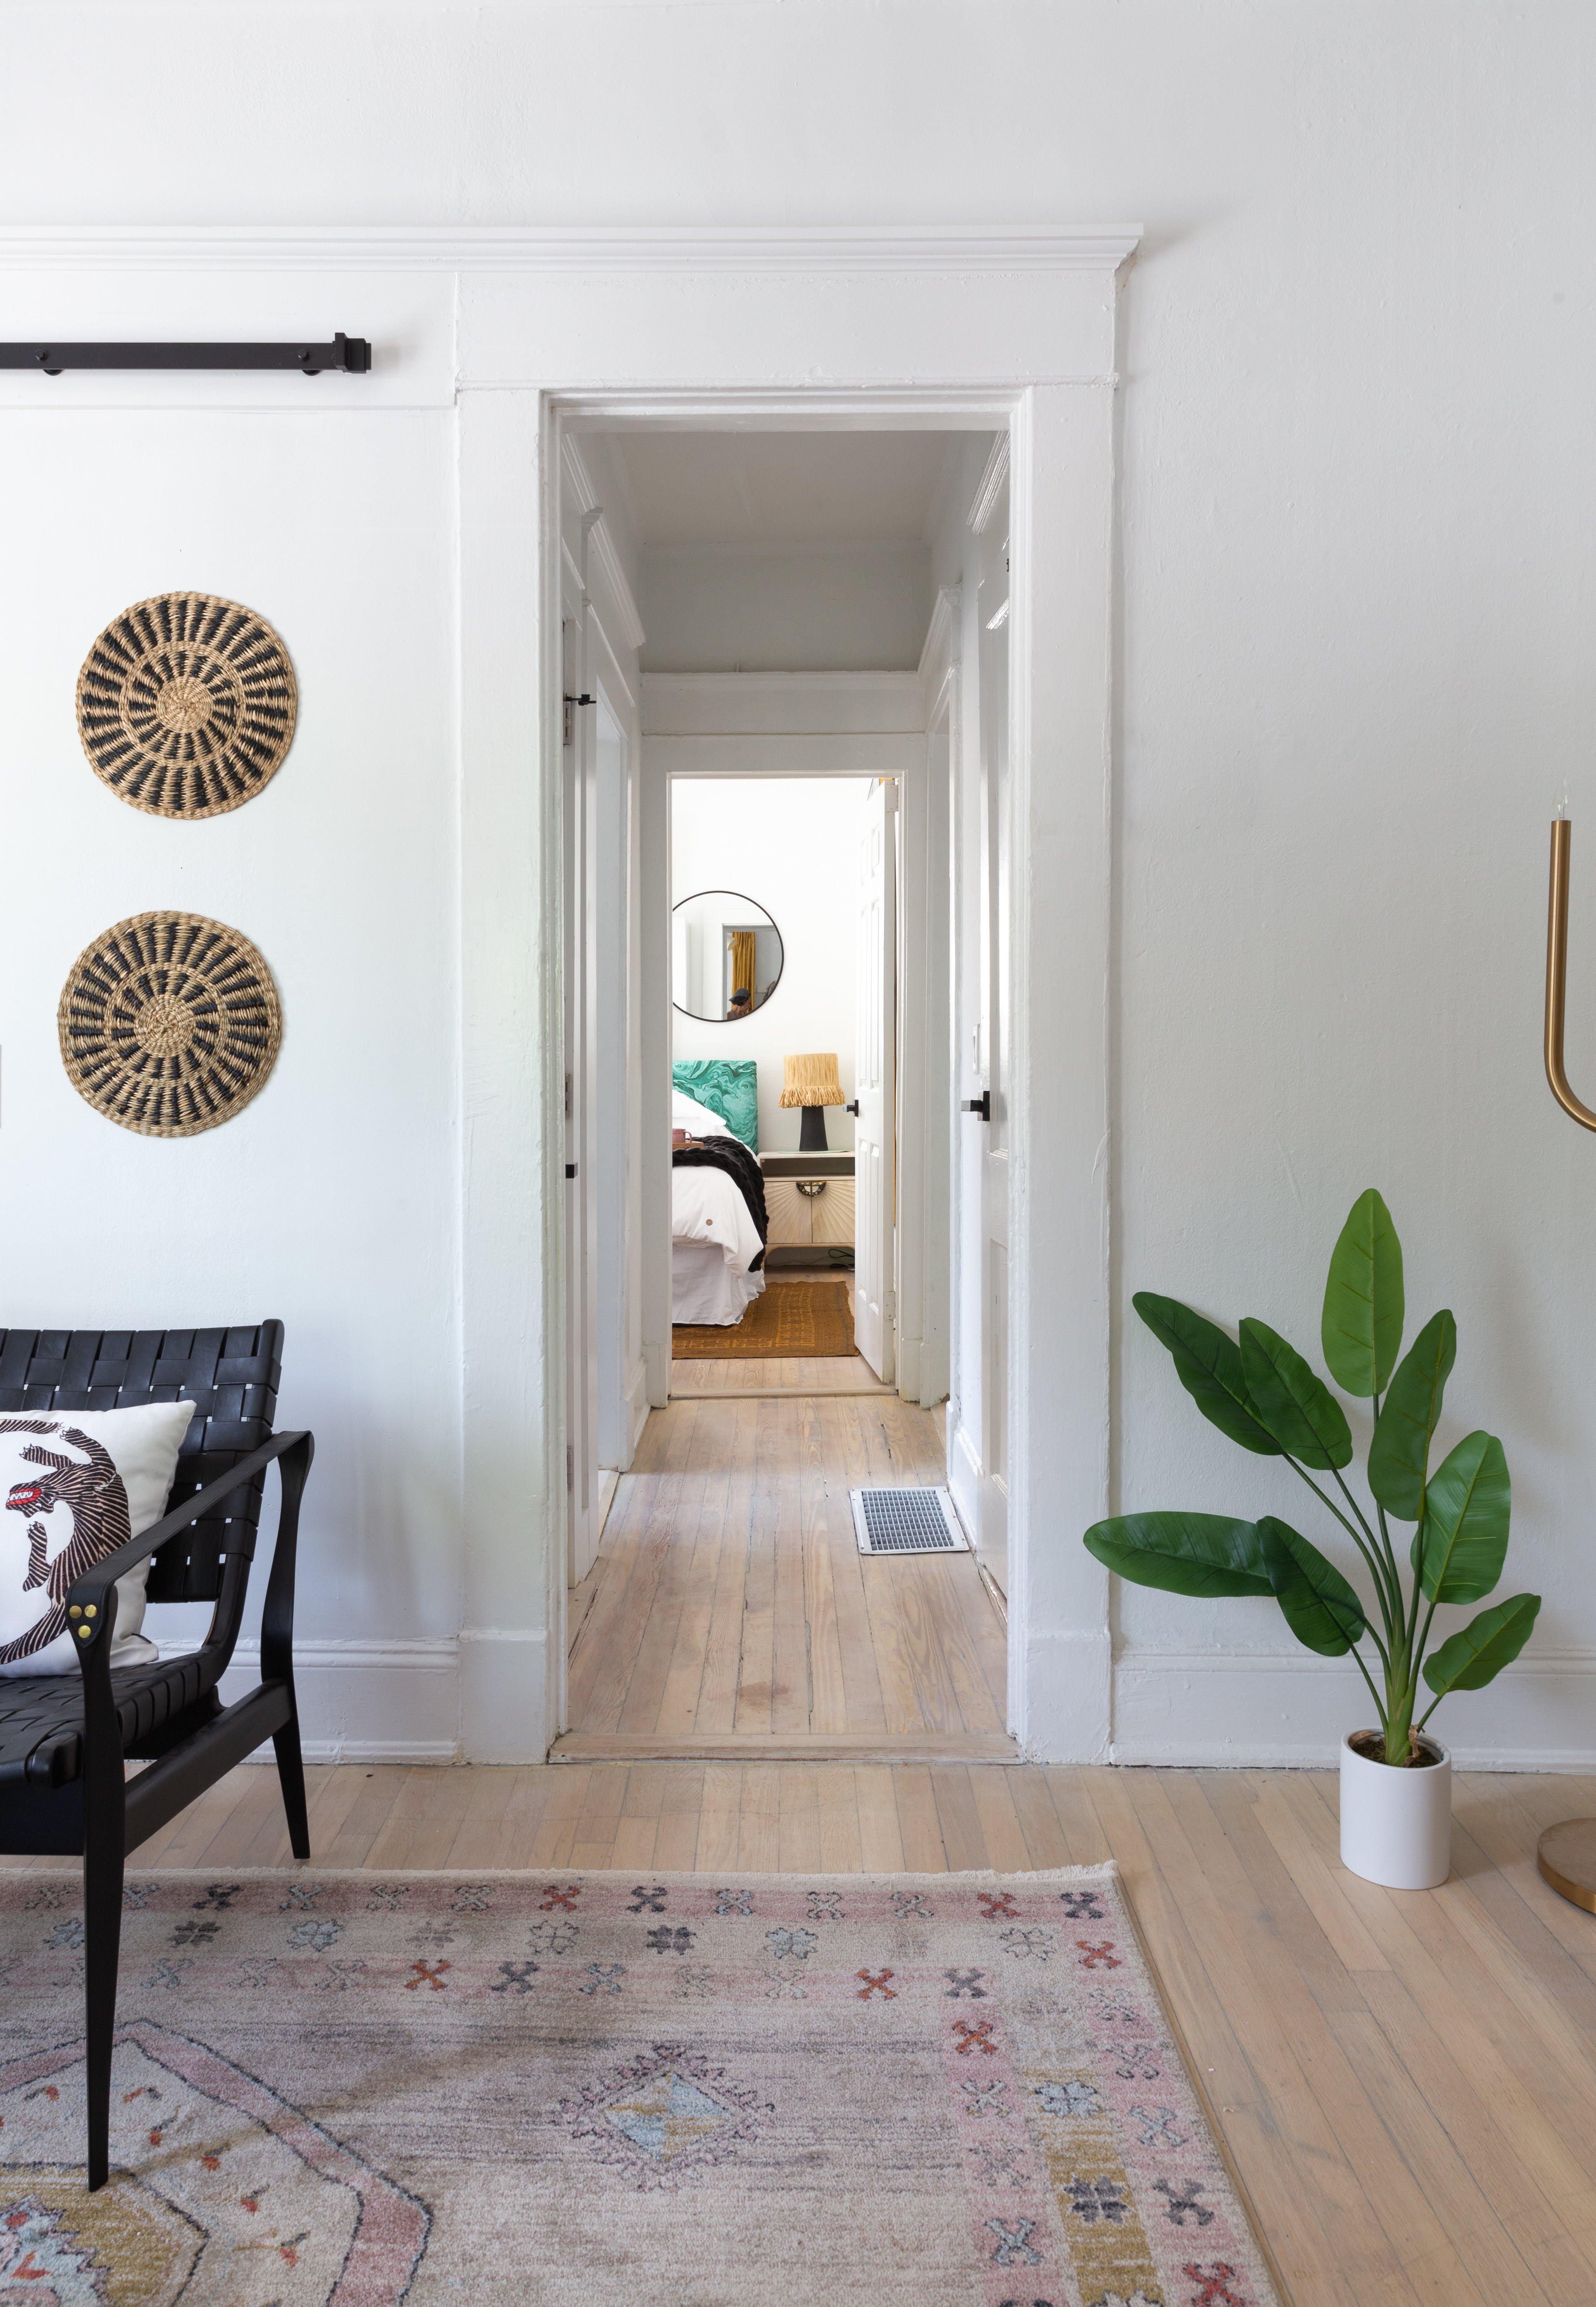 20 hallway 20210728-IMG_1114.jpg